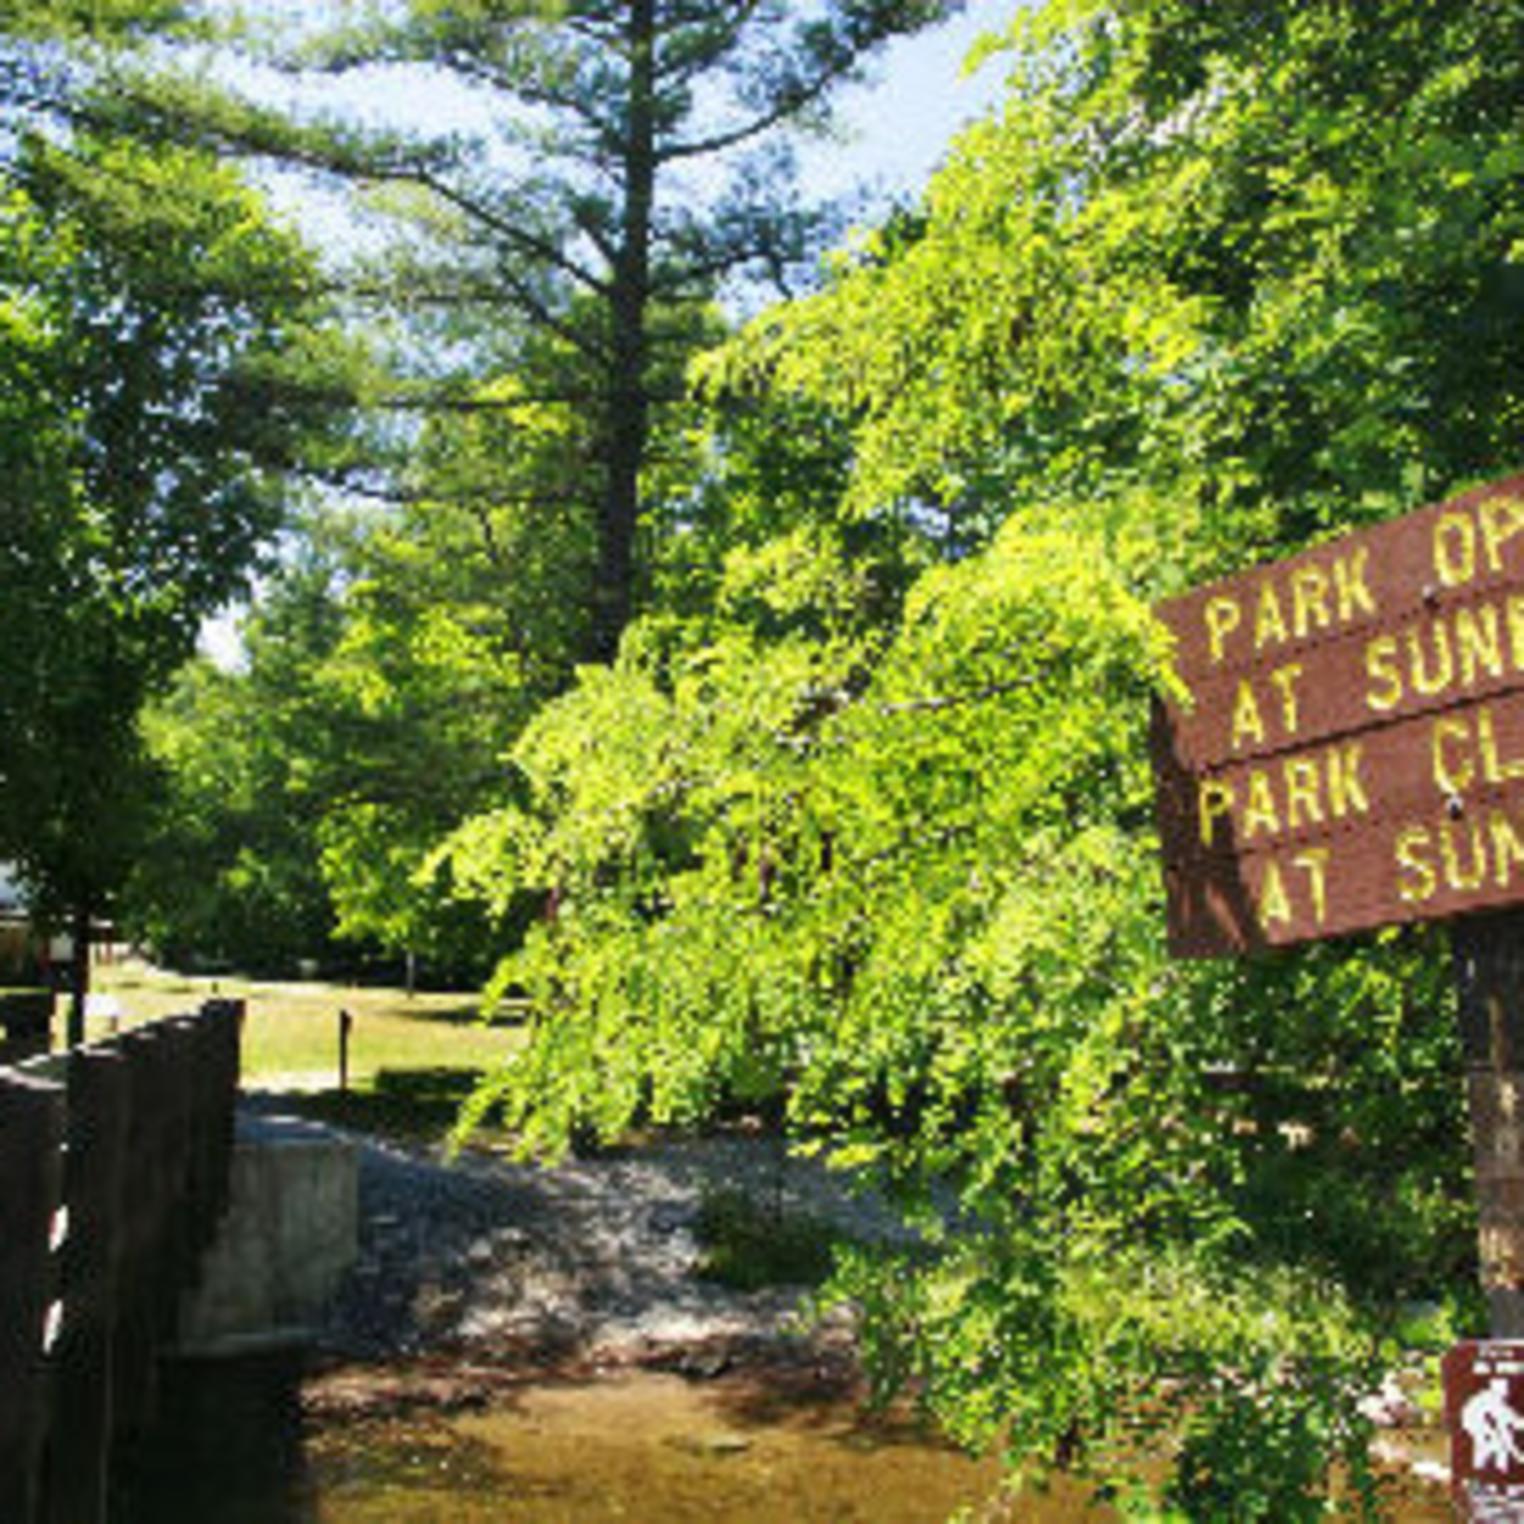 Caledonia State Park